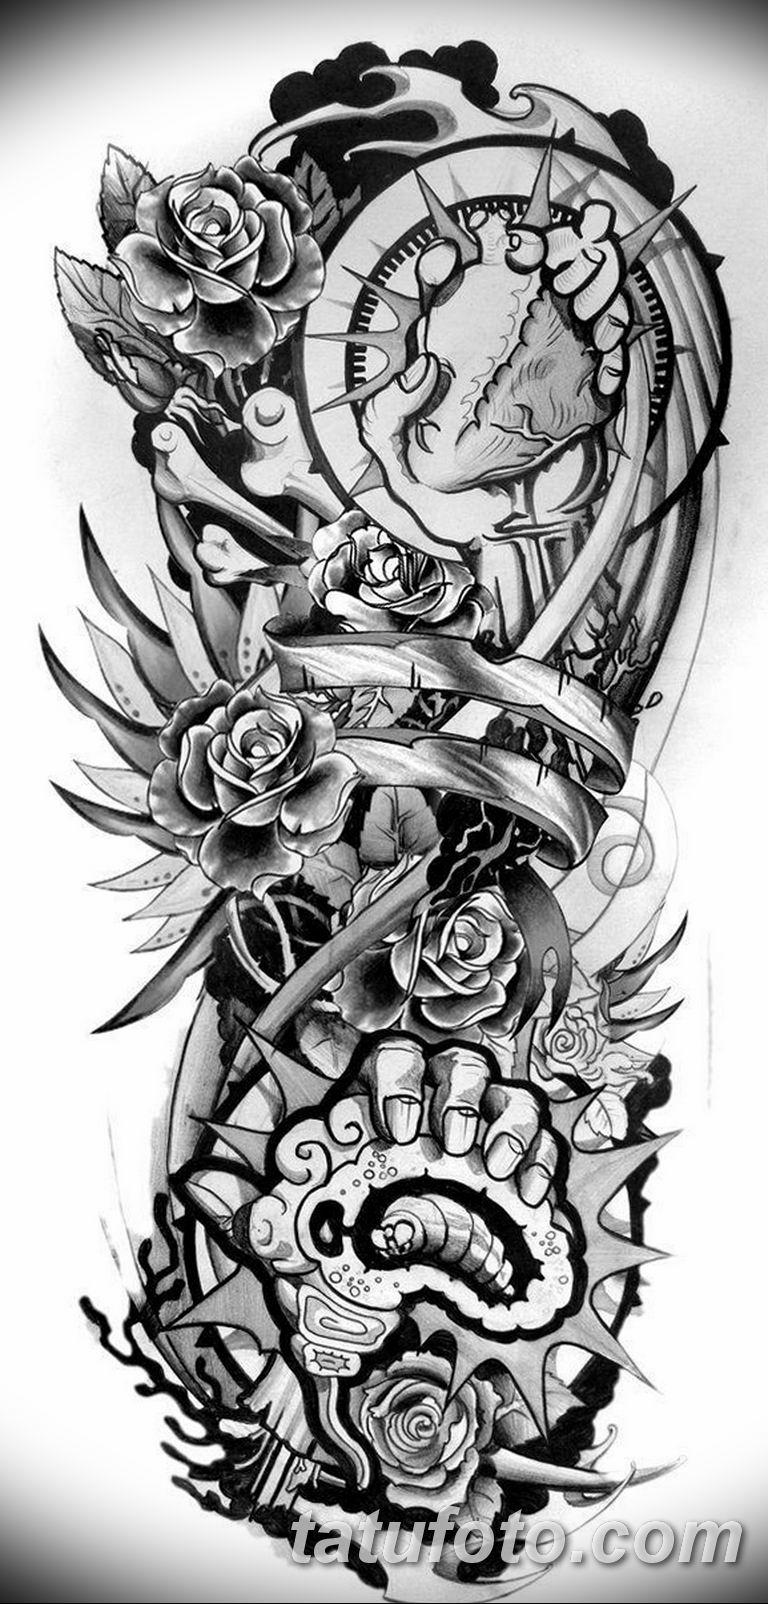 эскизы тату для мужчины 09032019 036 Tattoo Sketches For Men